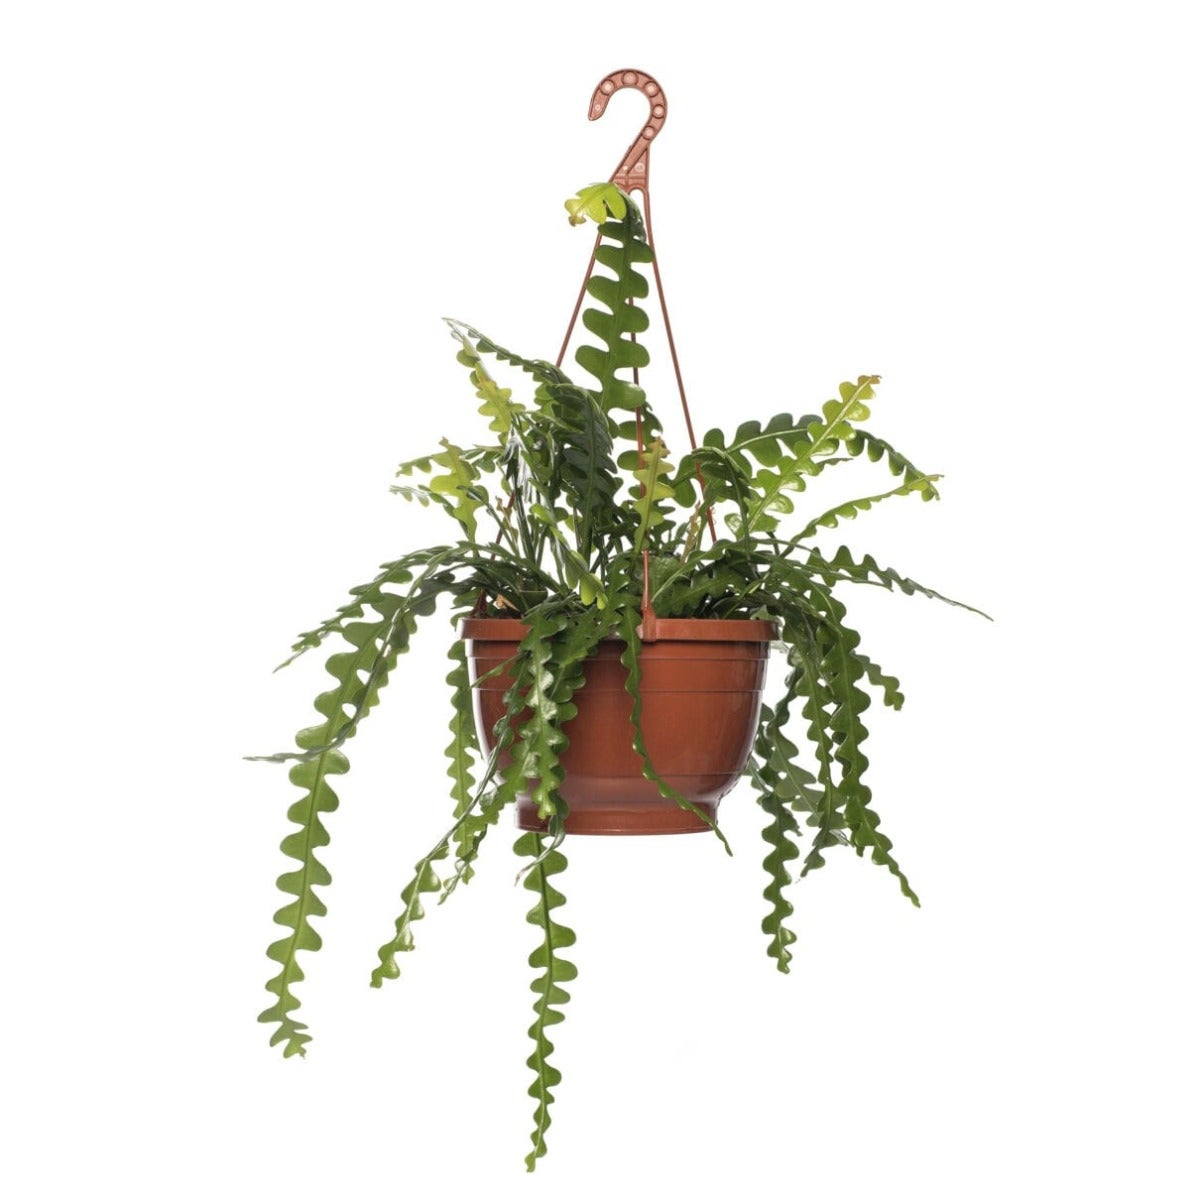 Zaagcactus (Epiphyllum anguliger)